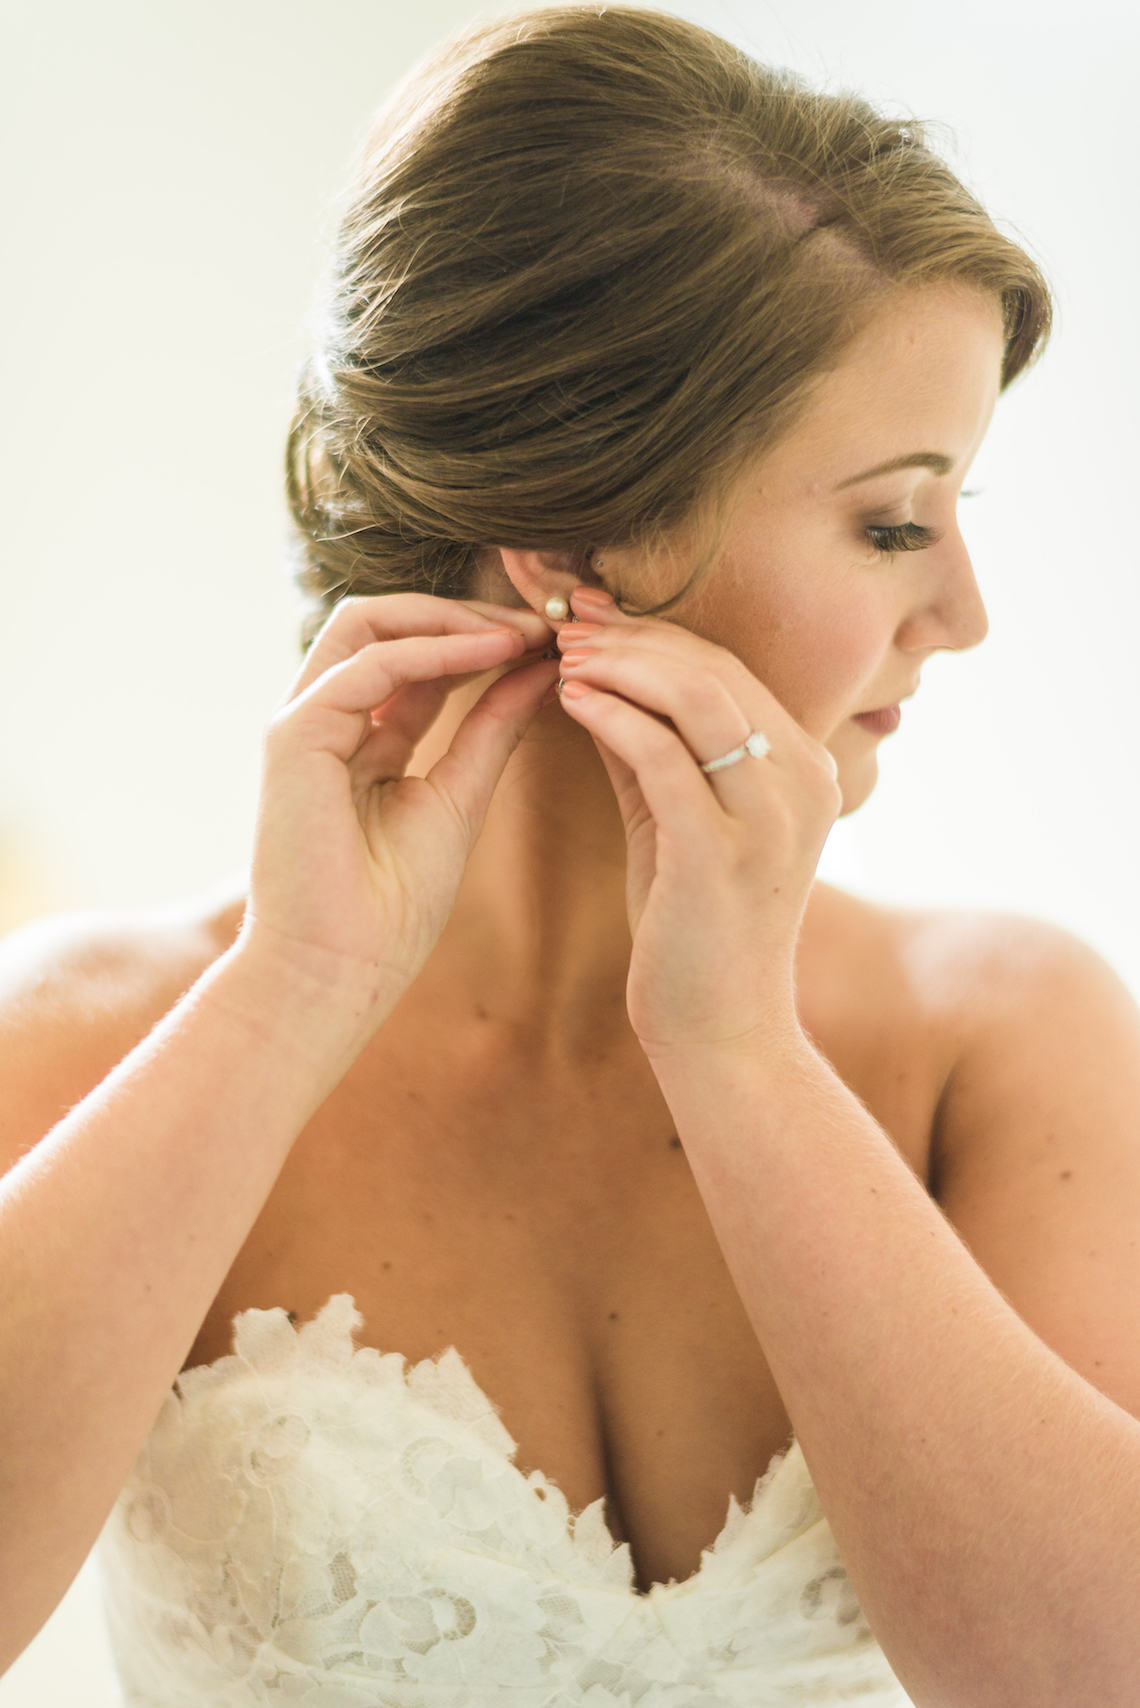 Lace Wedding Dress - A Philander Chase Knox Estate Pennsylvania Wedding